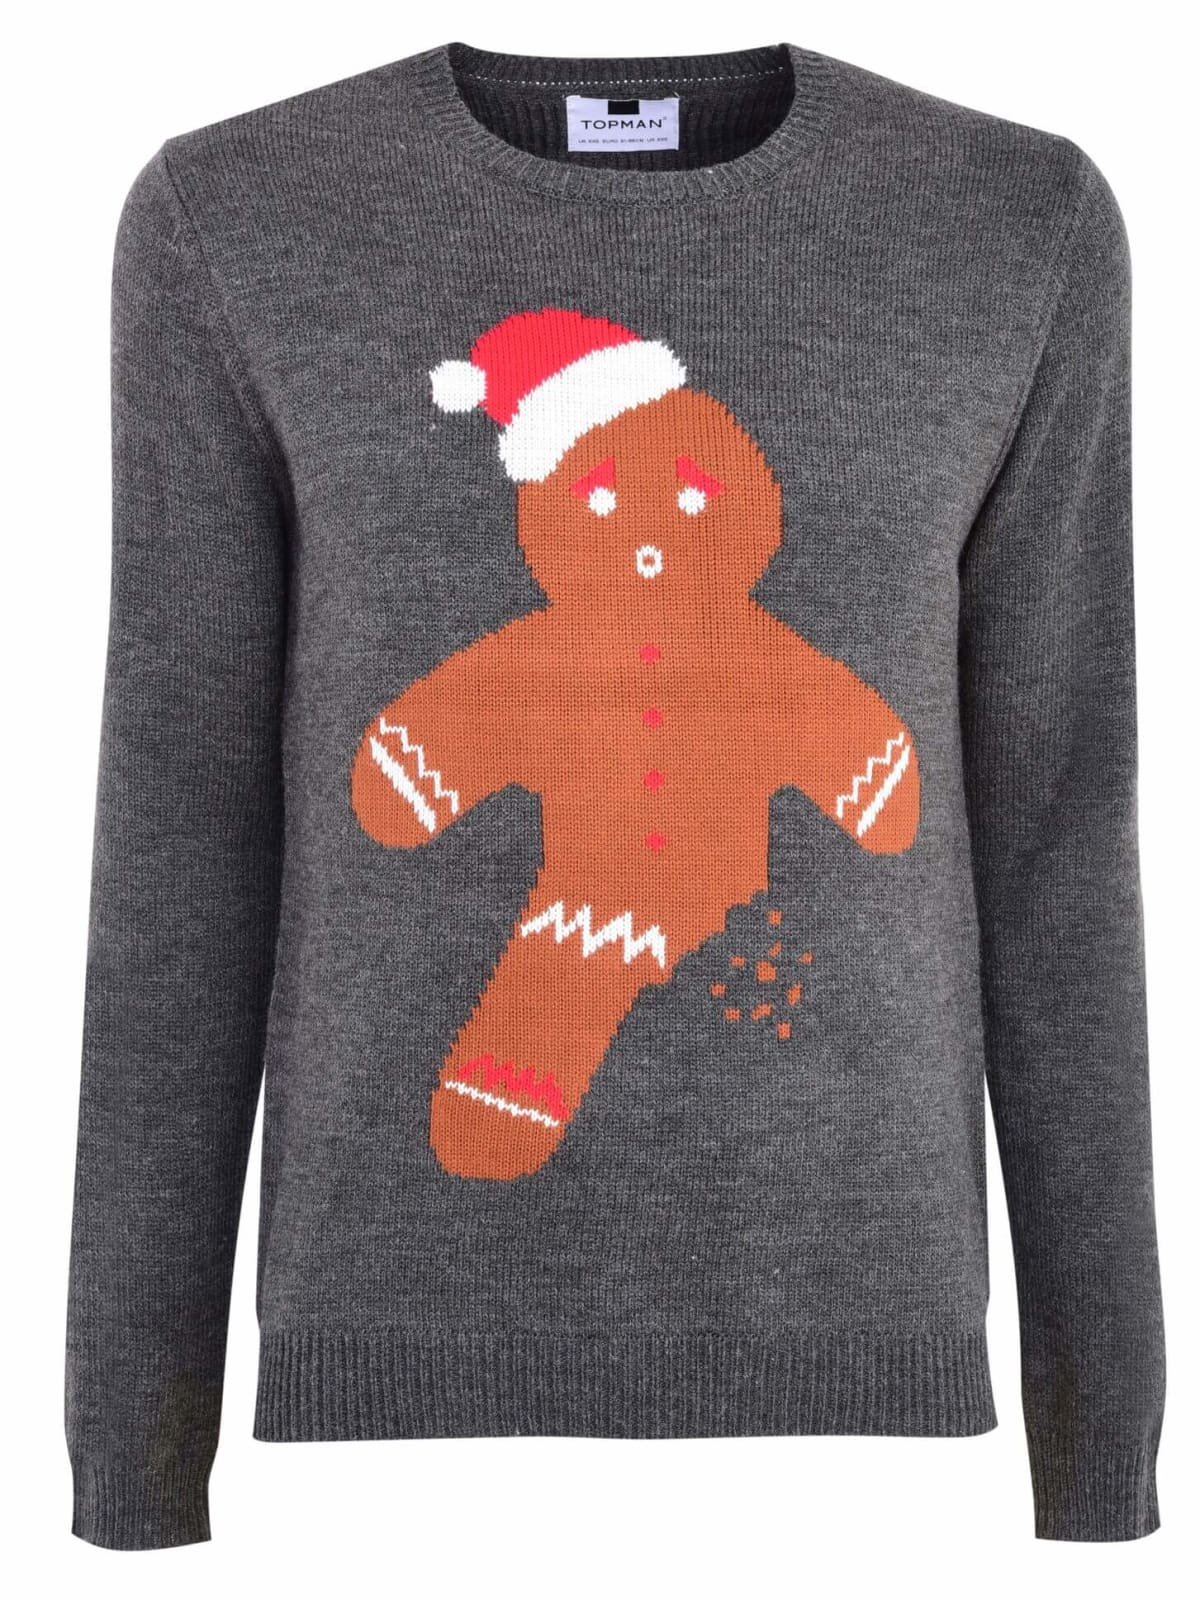 Topman holiday sweater